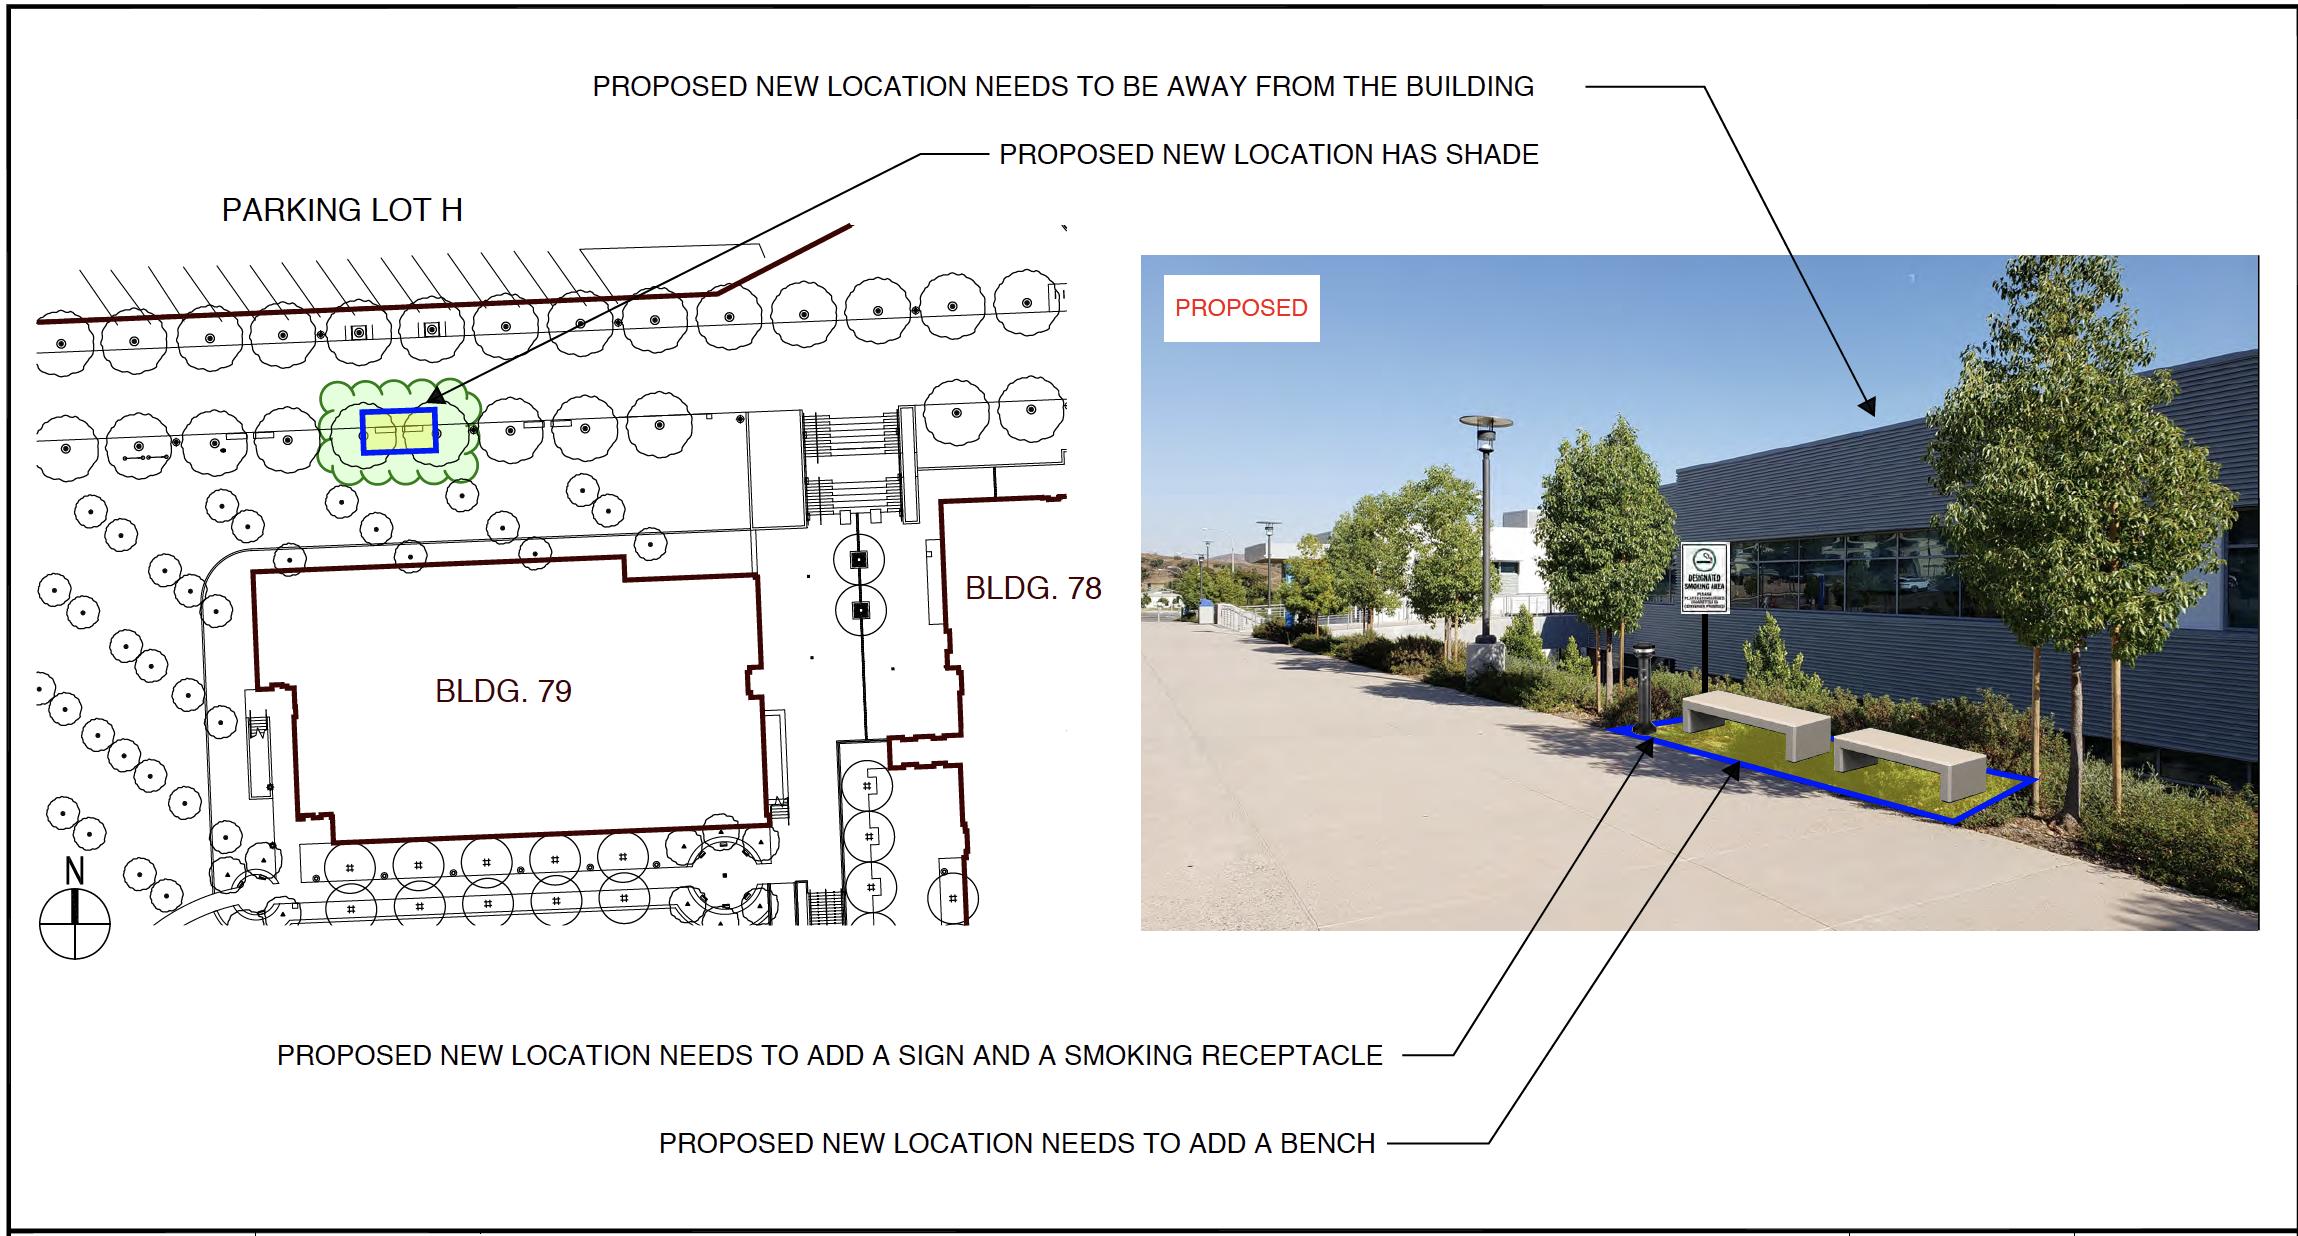 Proposed designated smoking area 6